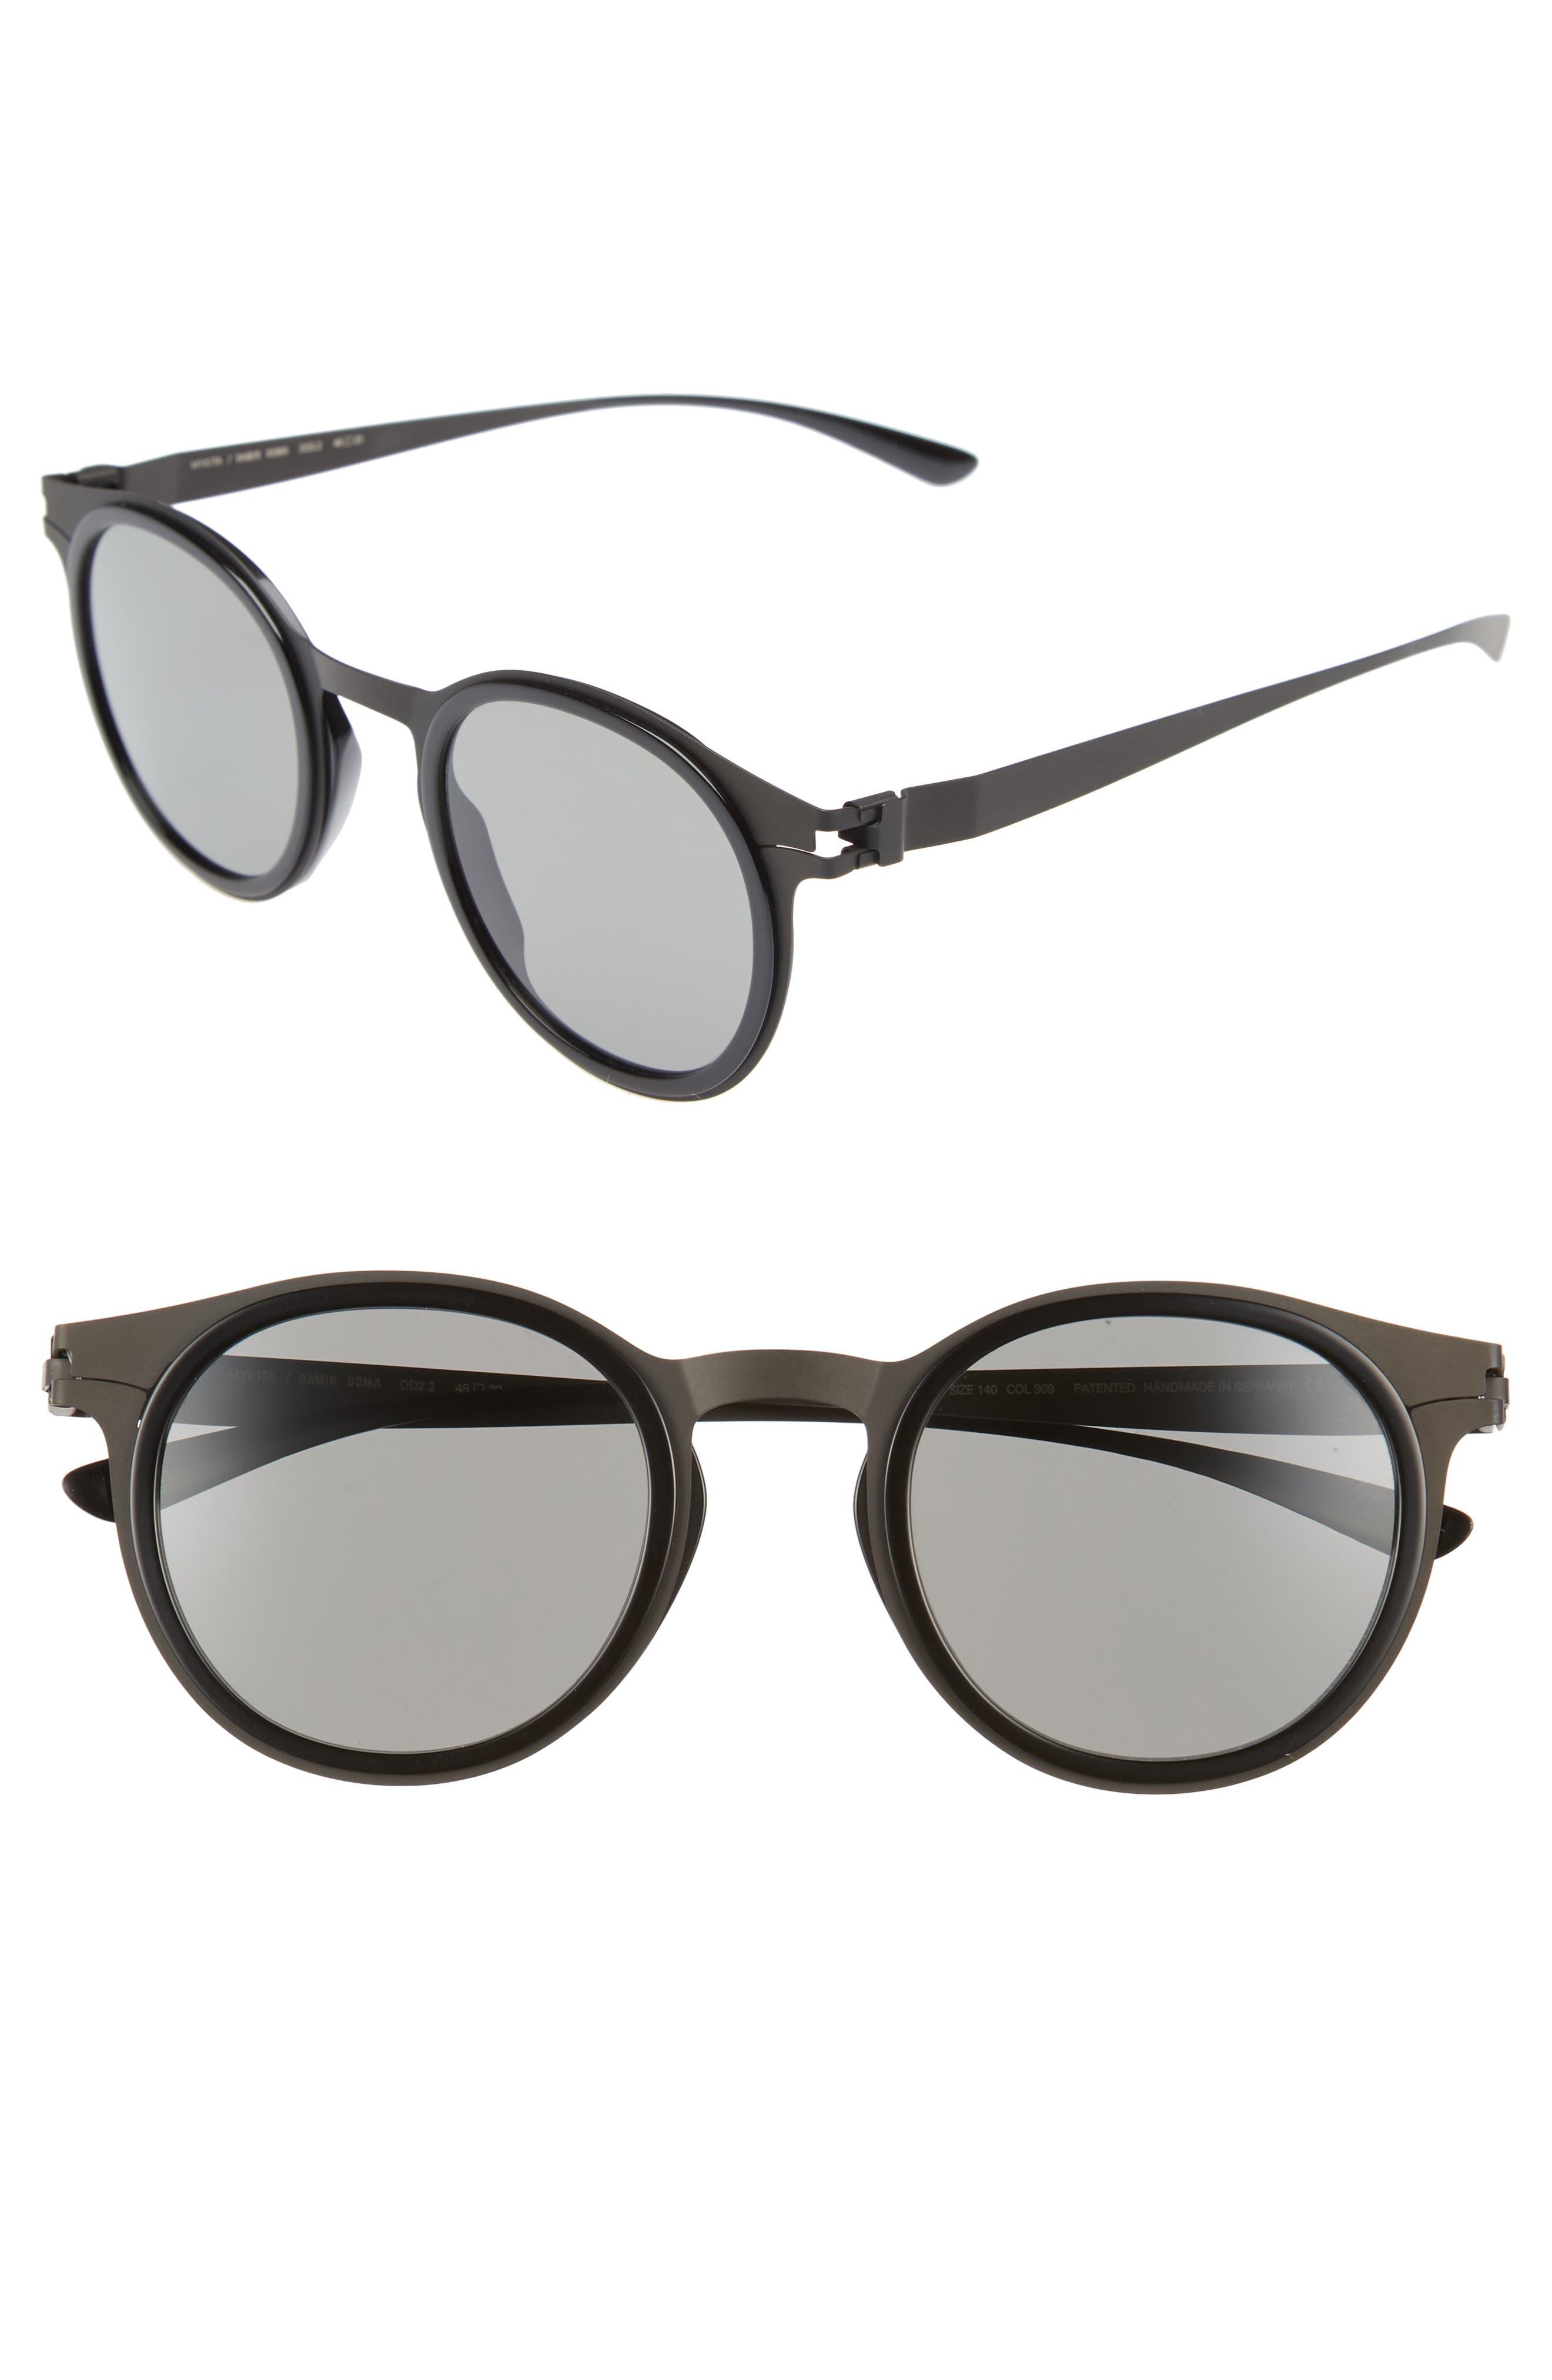 DD2.2 48mm Round Sunglasses,                         Main,                         color, Black/ Black